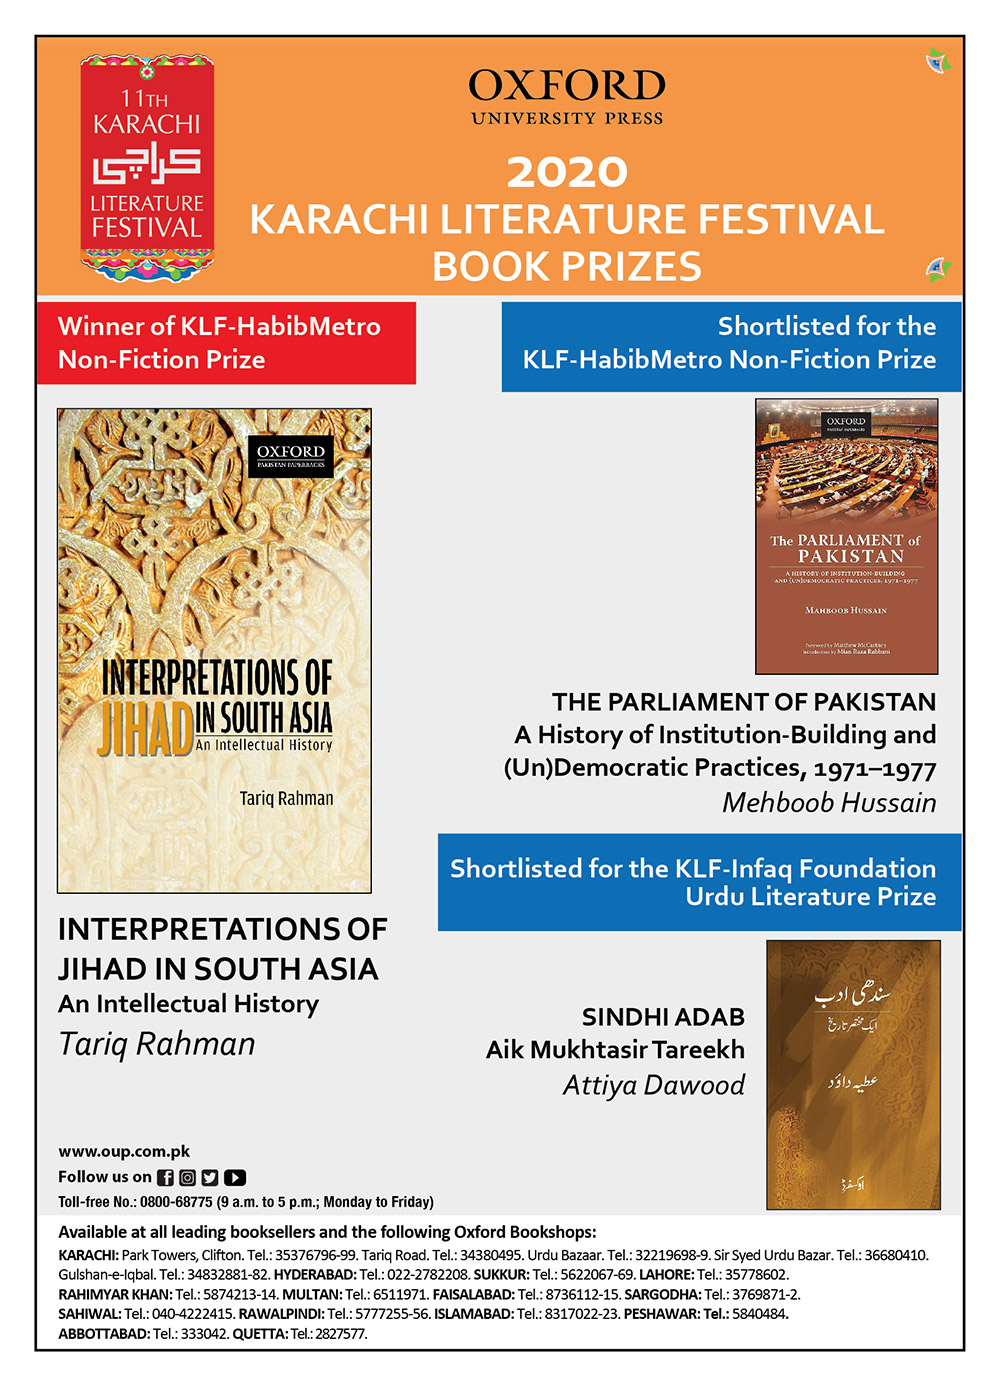 KARACHI LITERATURE FESTIVAL Book Prizes